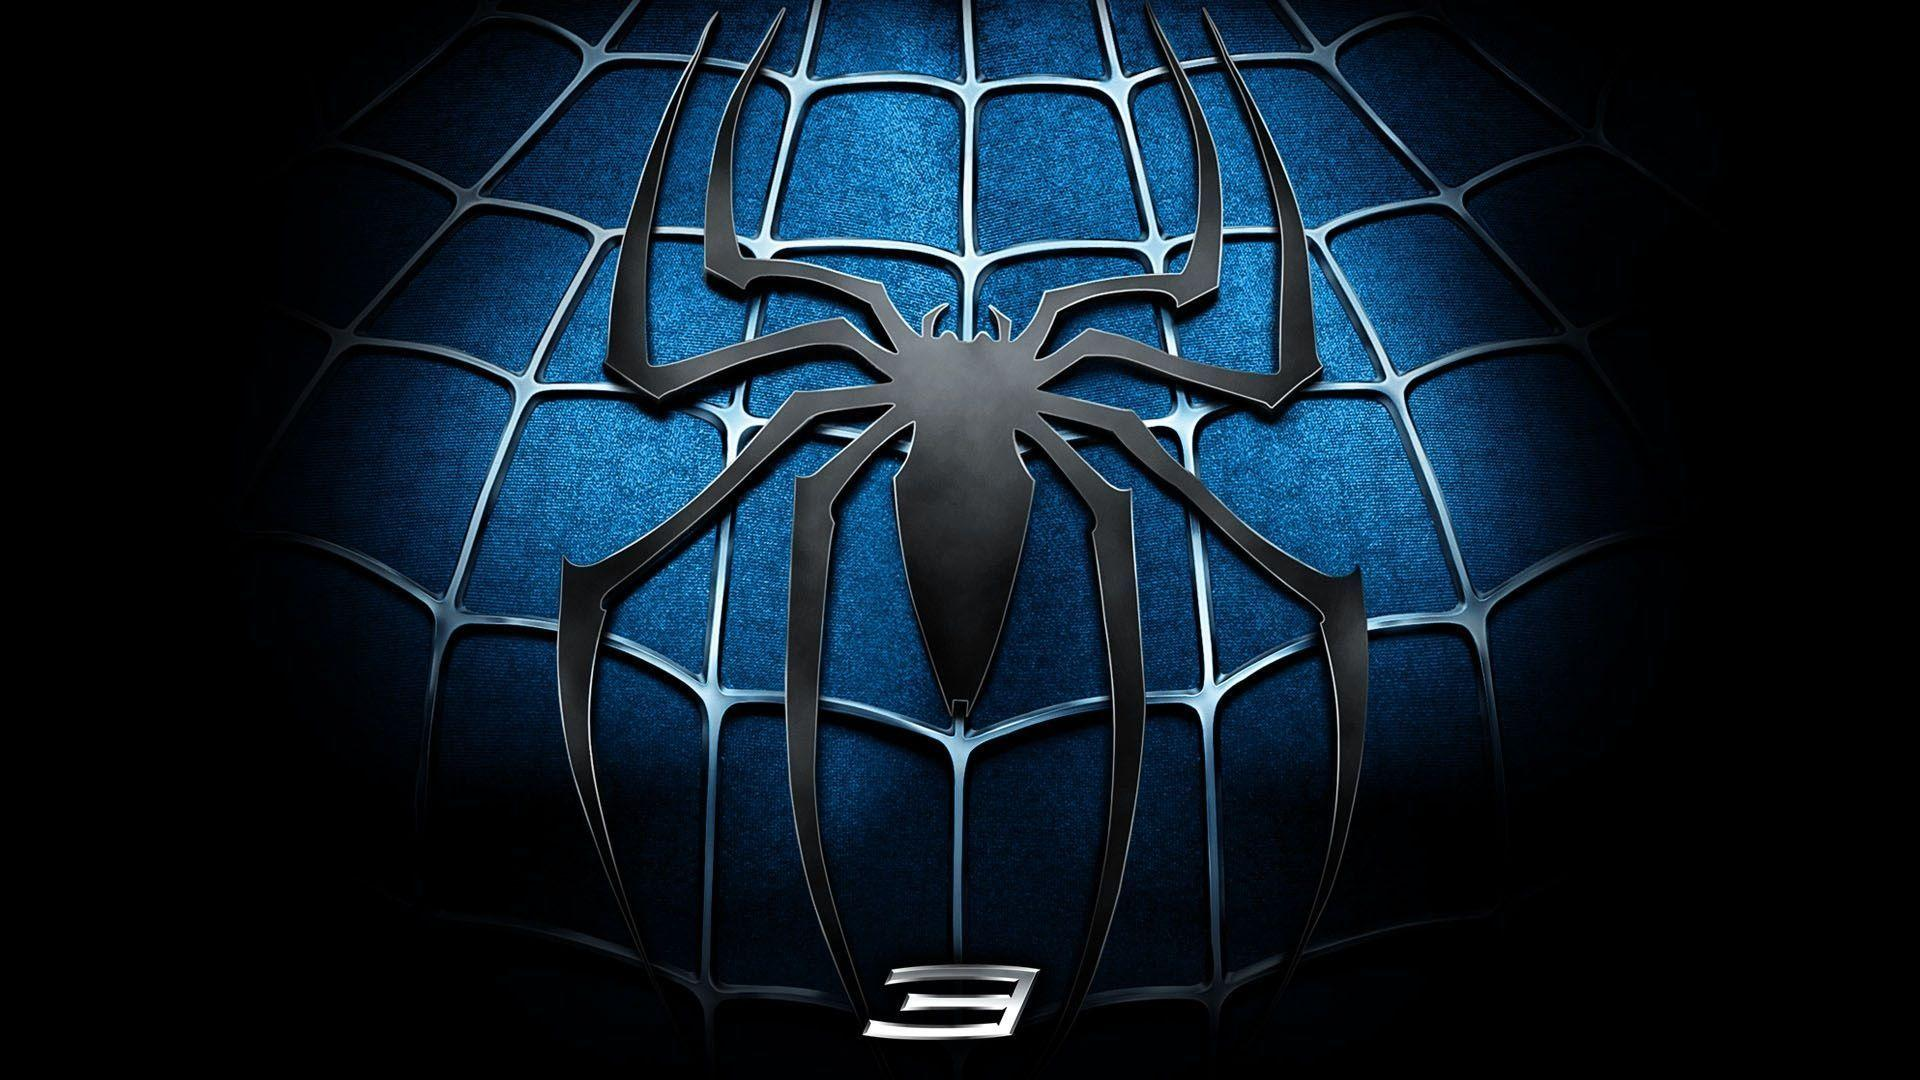 Hd wallpaper spiderman - Black Spiderman Logo Wallpaper Cool Hd